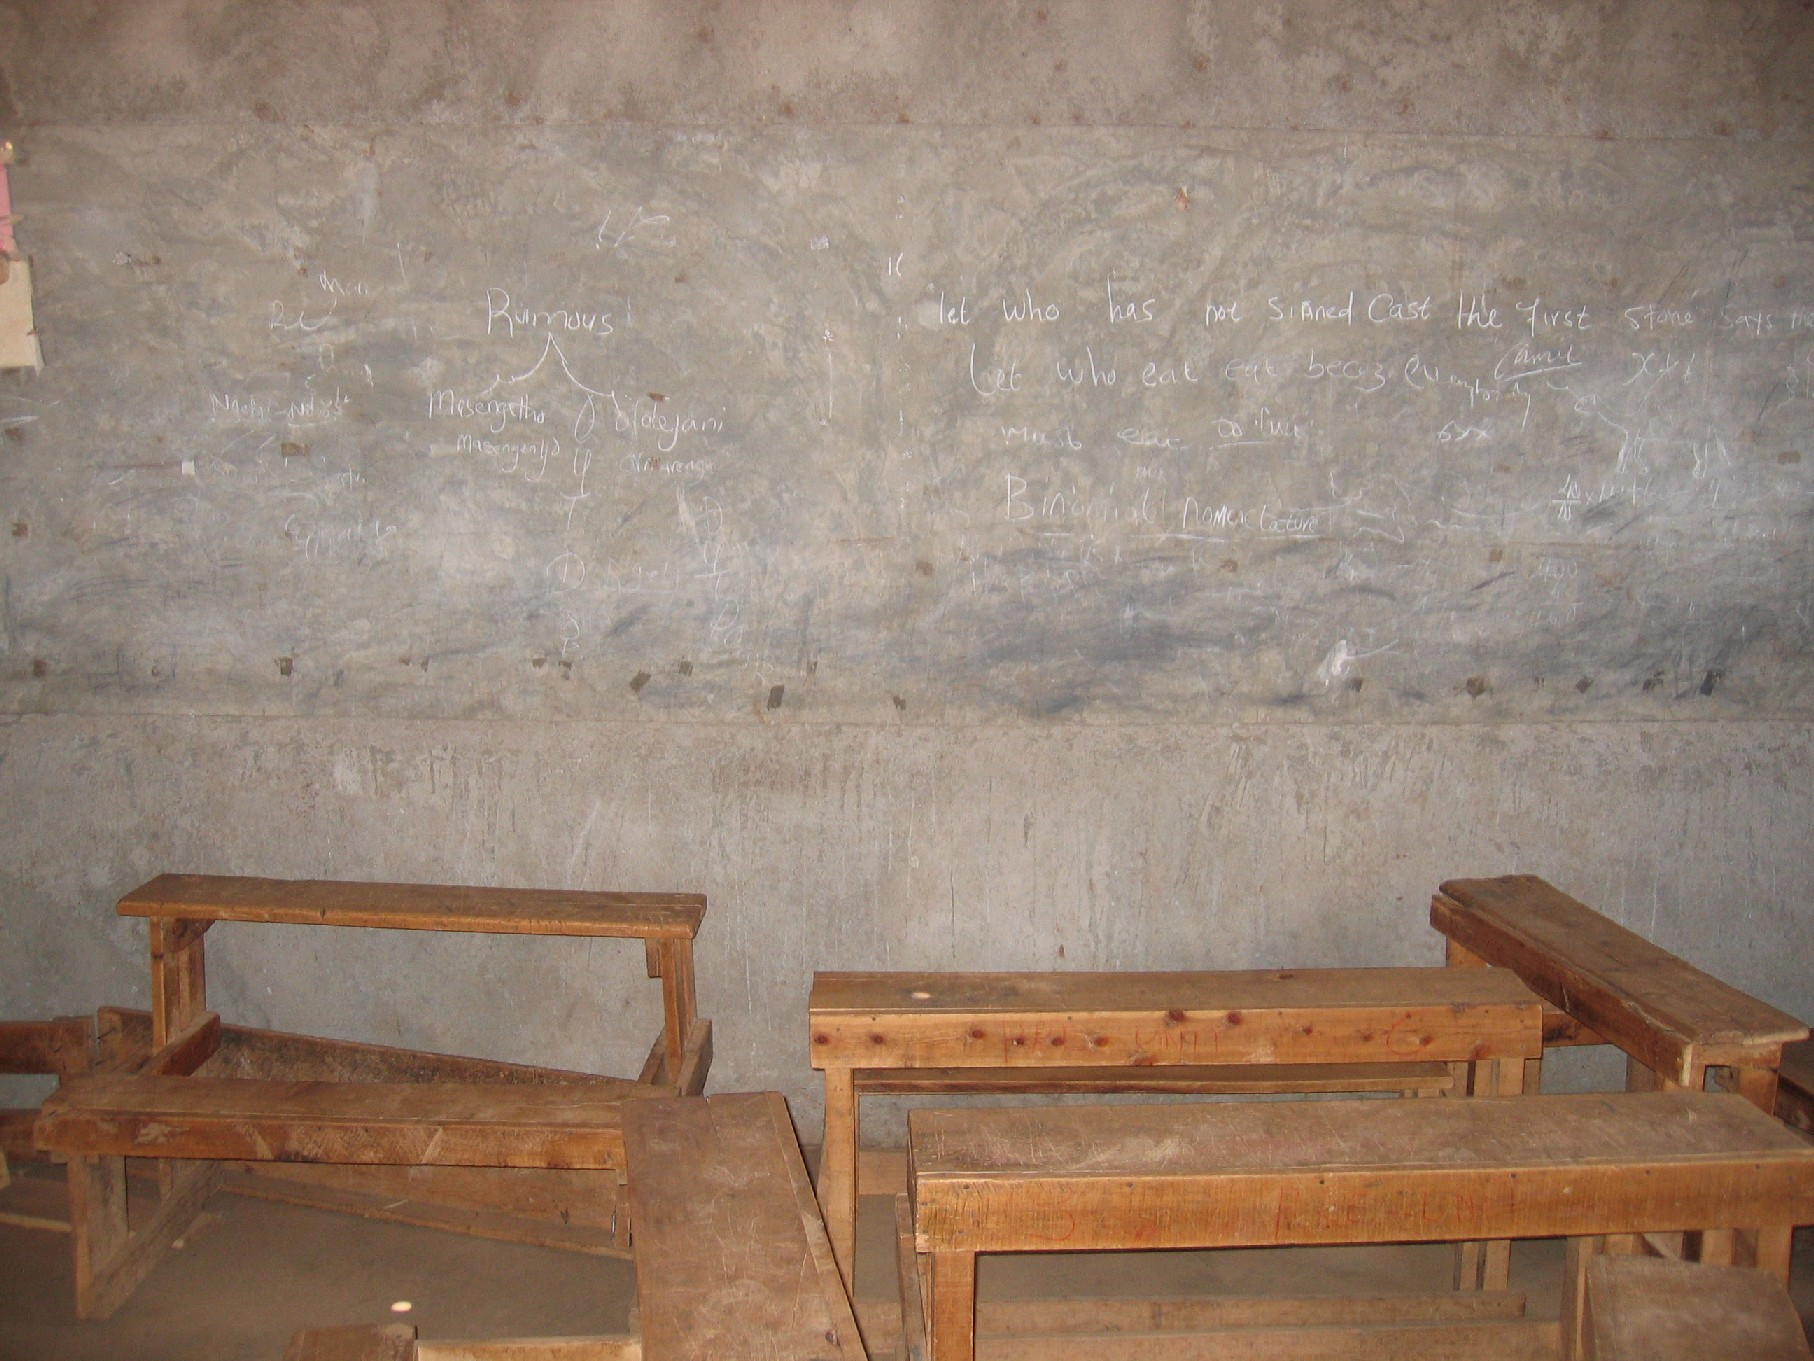 kenya_riftvalley_school 03